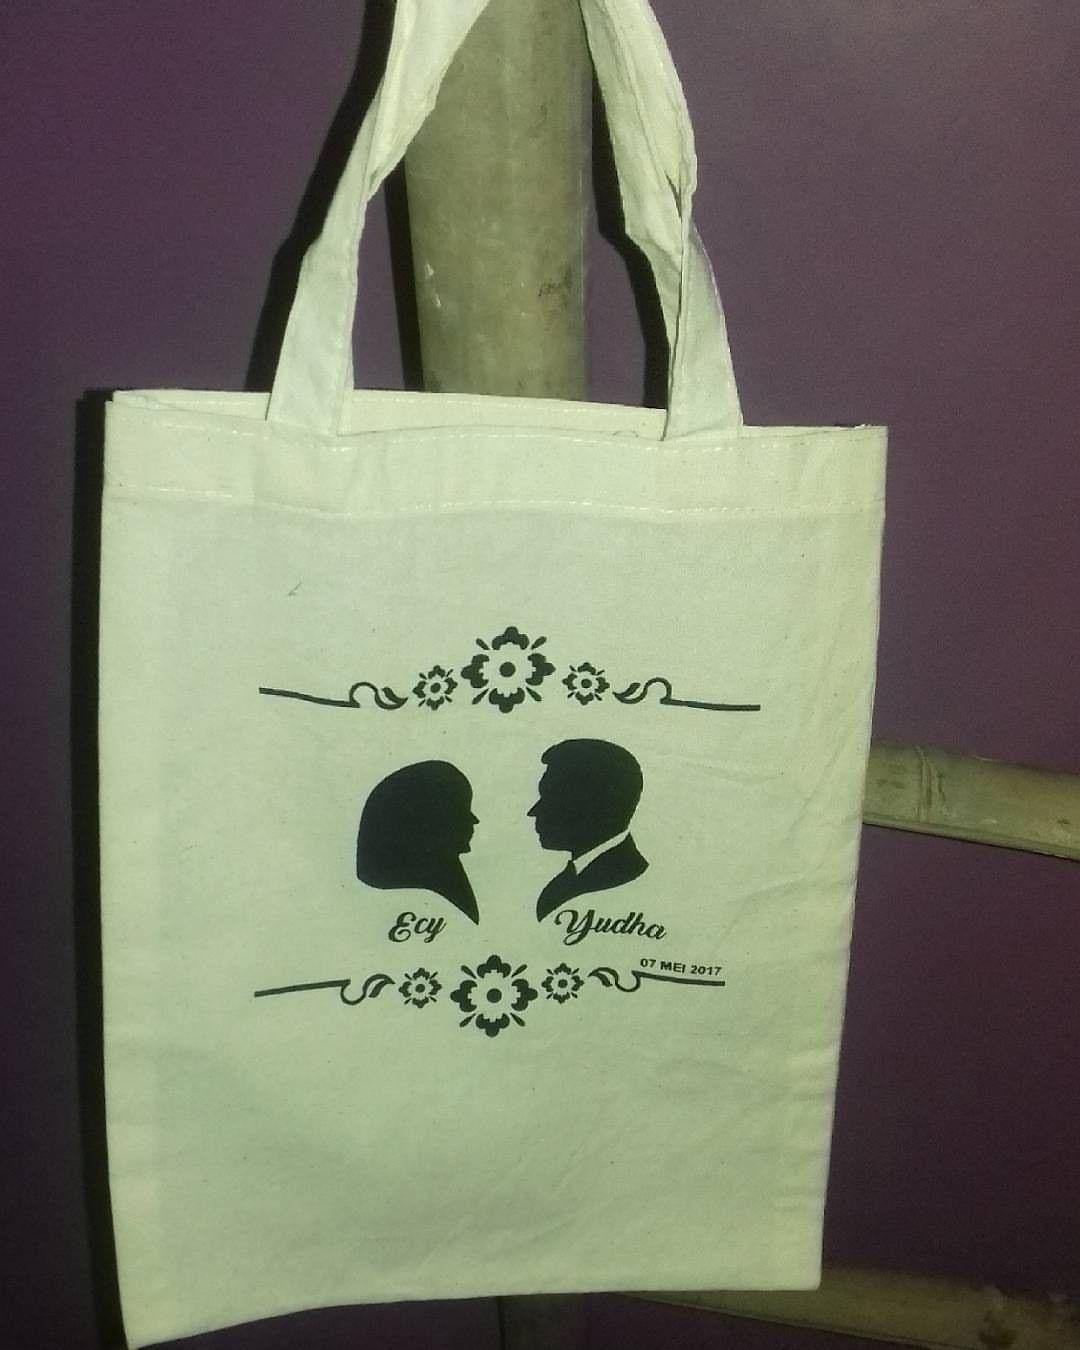 harga tas spunbond undangan pernikahan souvenir pernikahan, tas spunbond, tas souvenir pernikahan